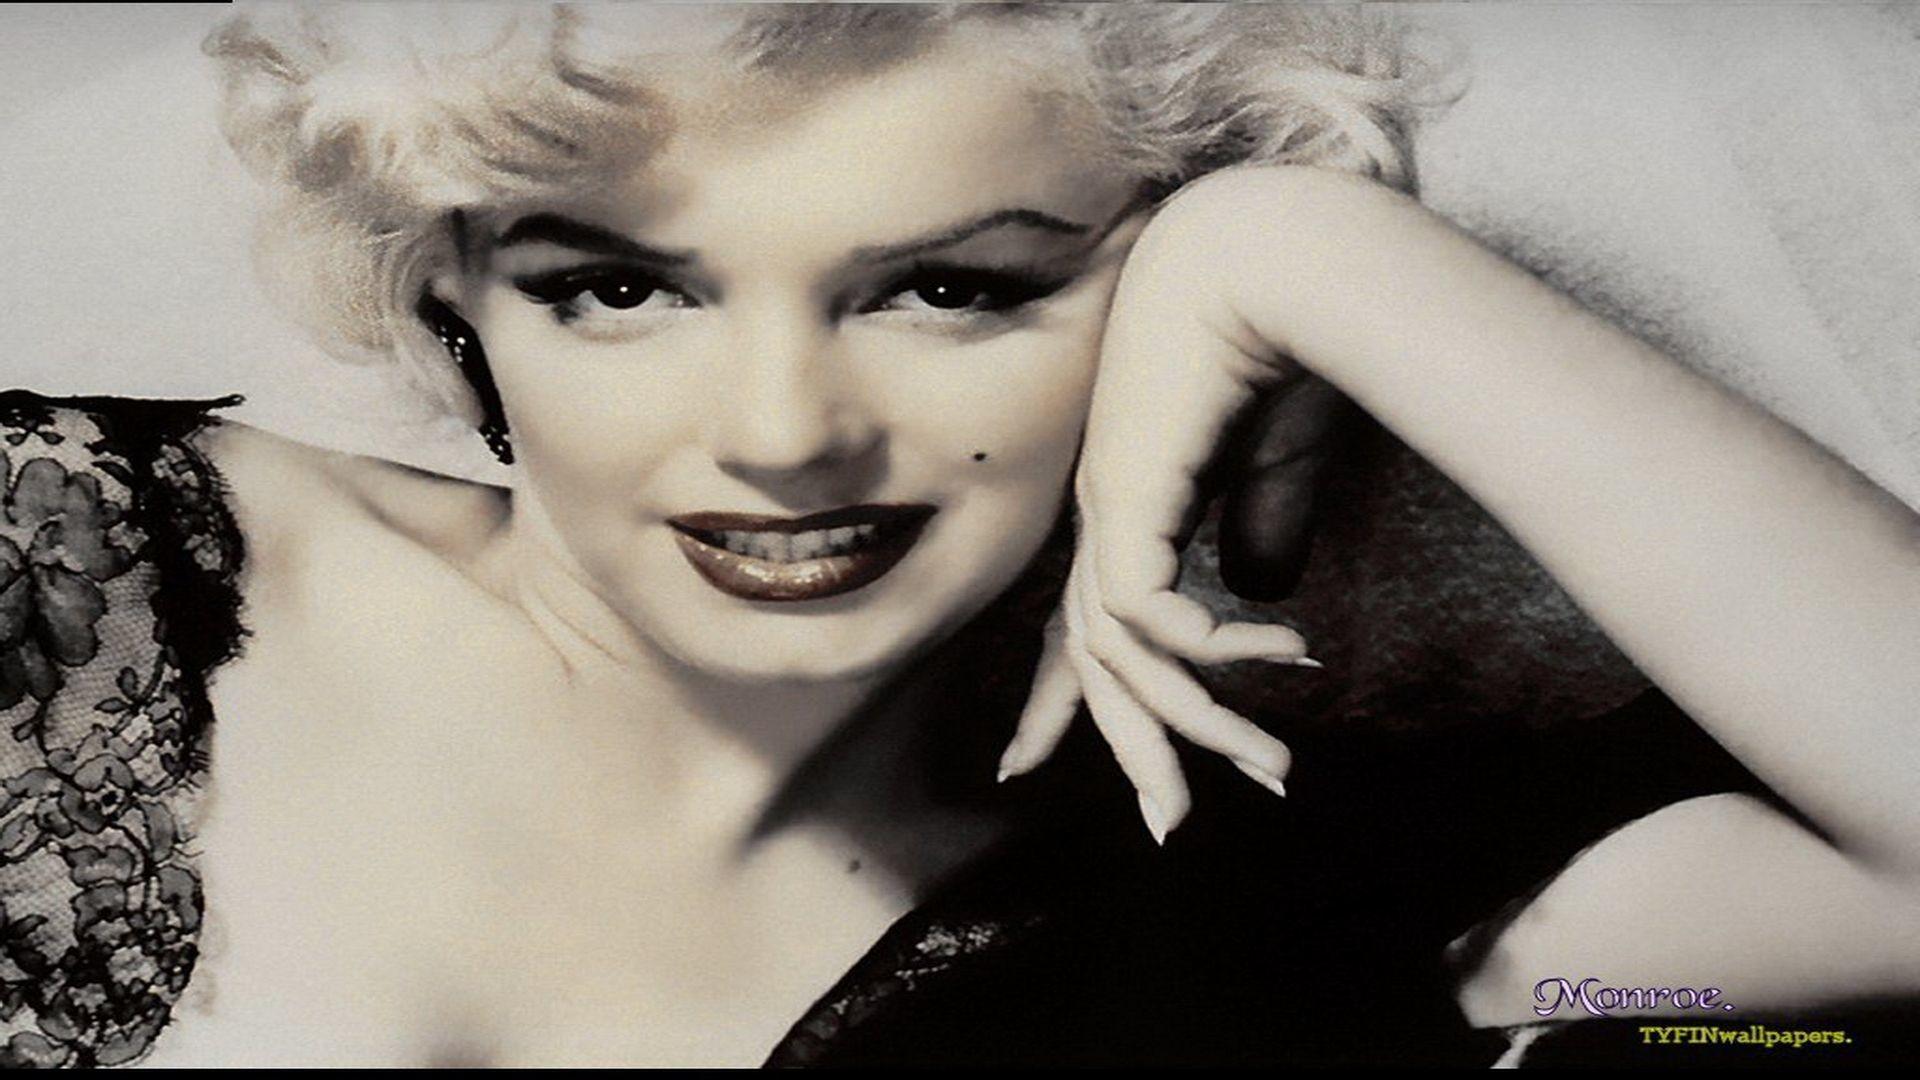 Res: 1920x1080, marilyn monroe wallpapers | Marilyn Monroe Wallpapers, HD, Wallpaper,  Photo,